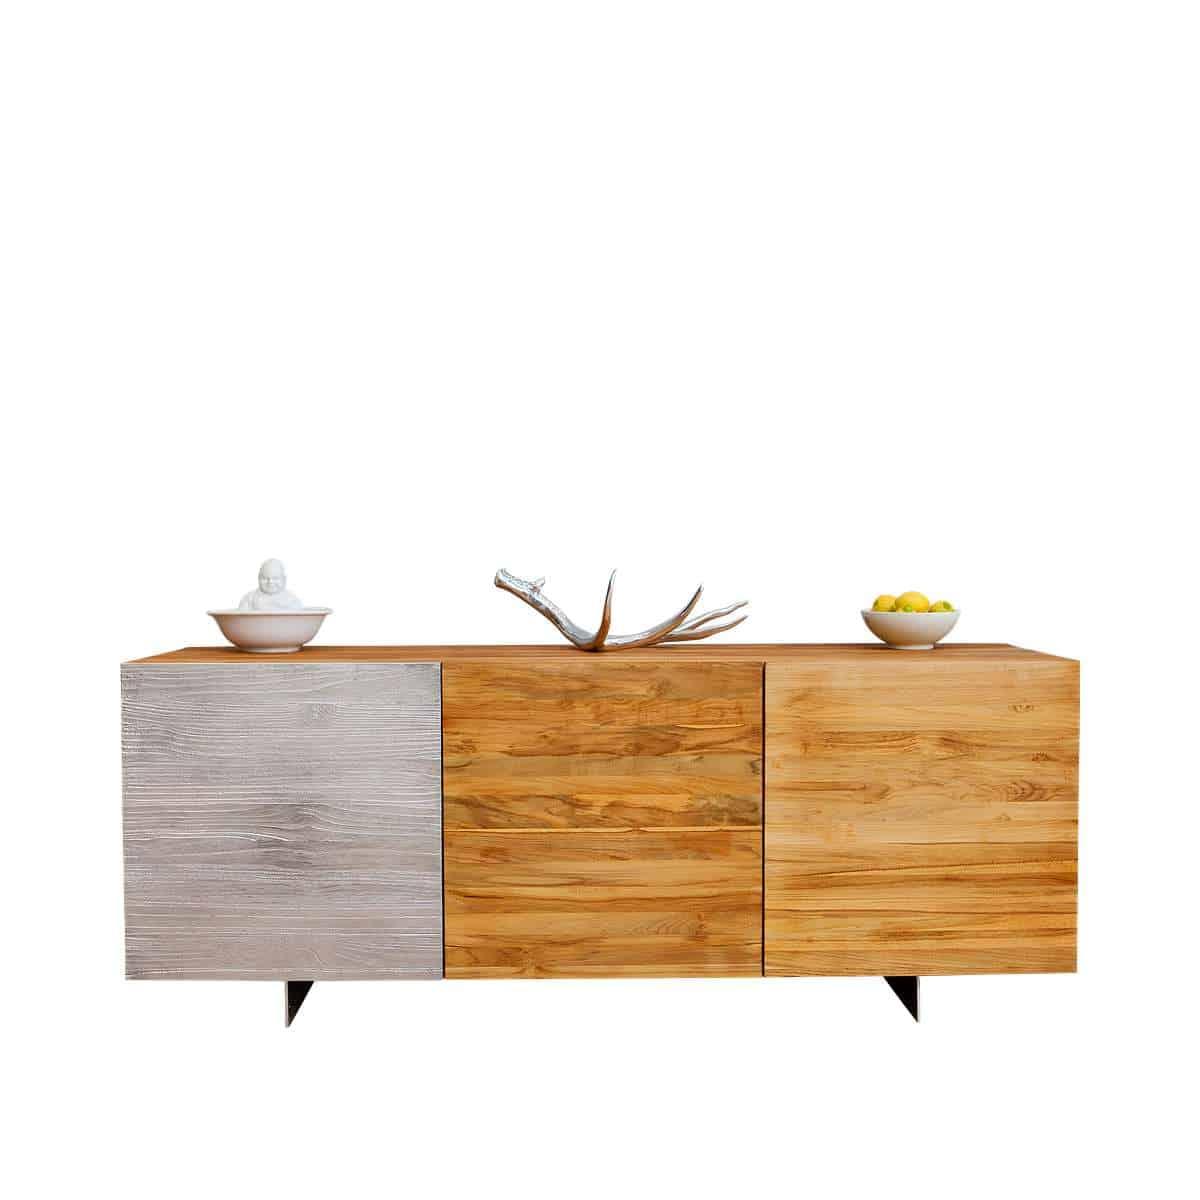 Mash Studios Furniture